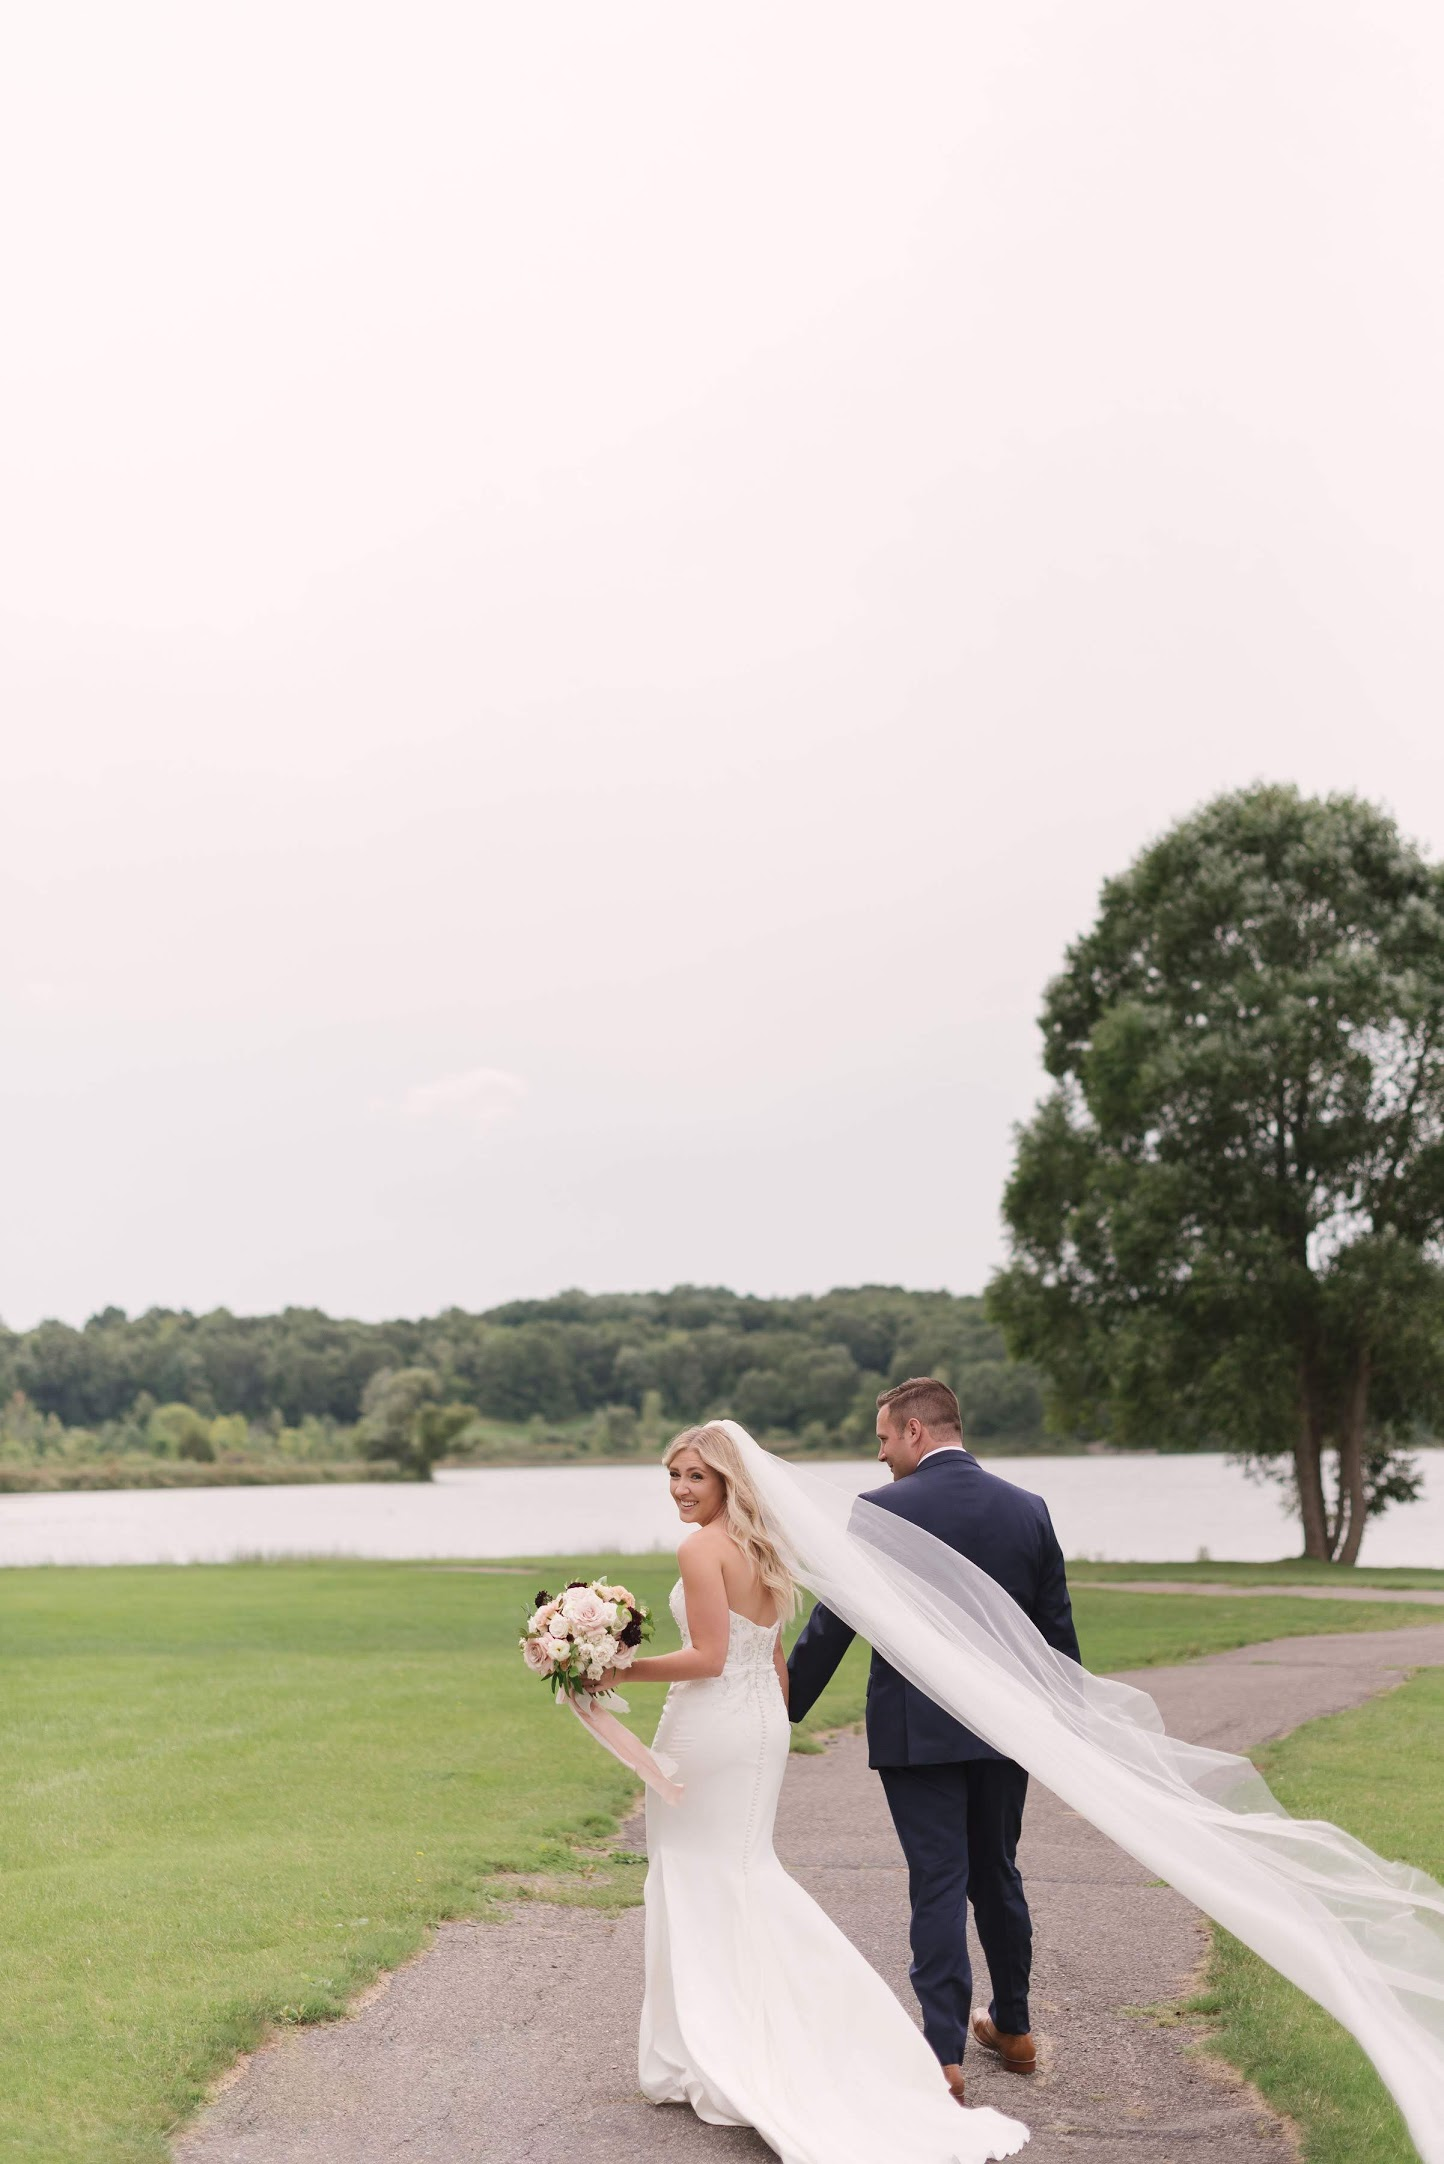 Field-Gems-Photography-Detroit-Michigan-Wedding-Photographer-Family-Photographer-Photobooth-090818-7163.jpg